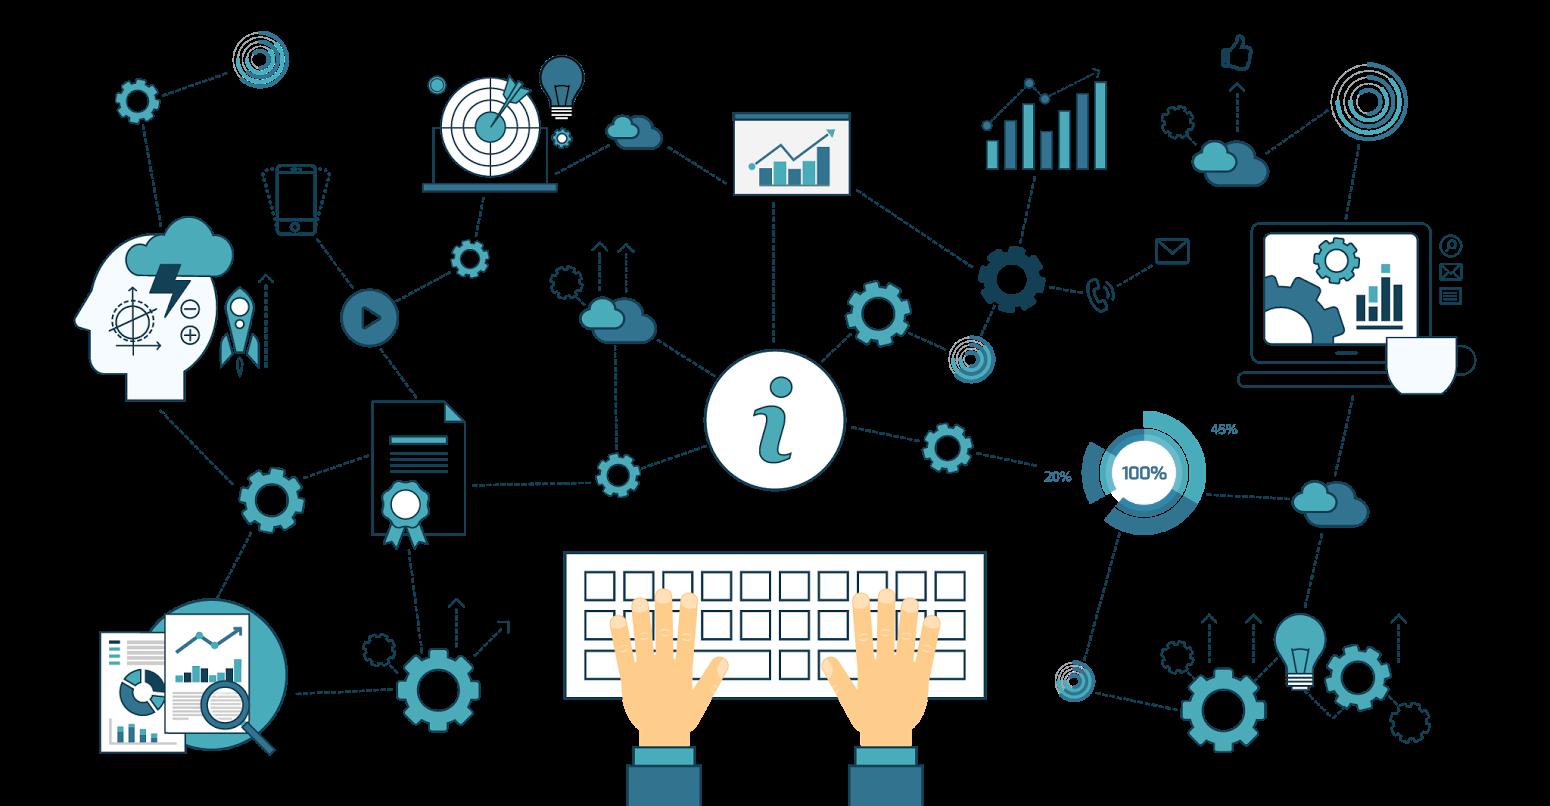 Build a customer focused. Marketing clipart marketing plan